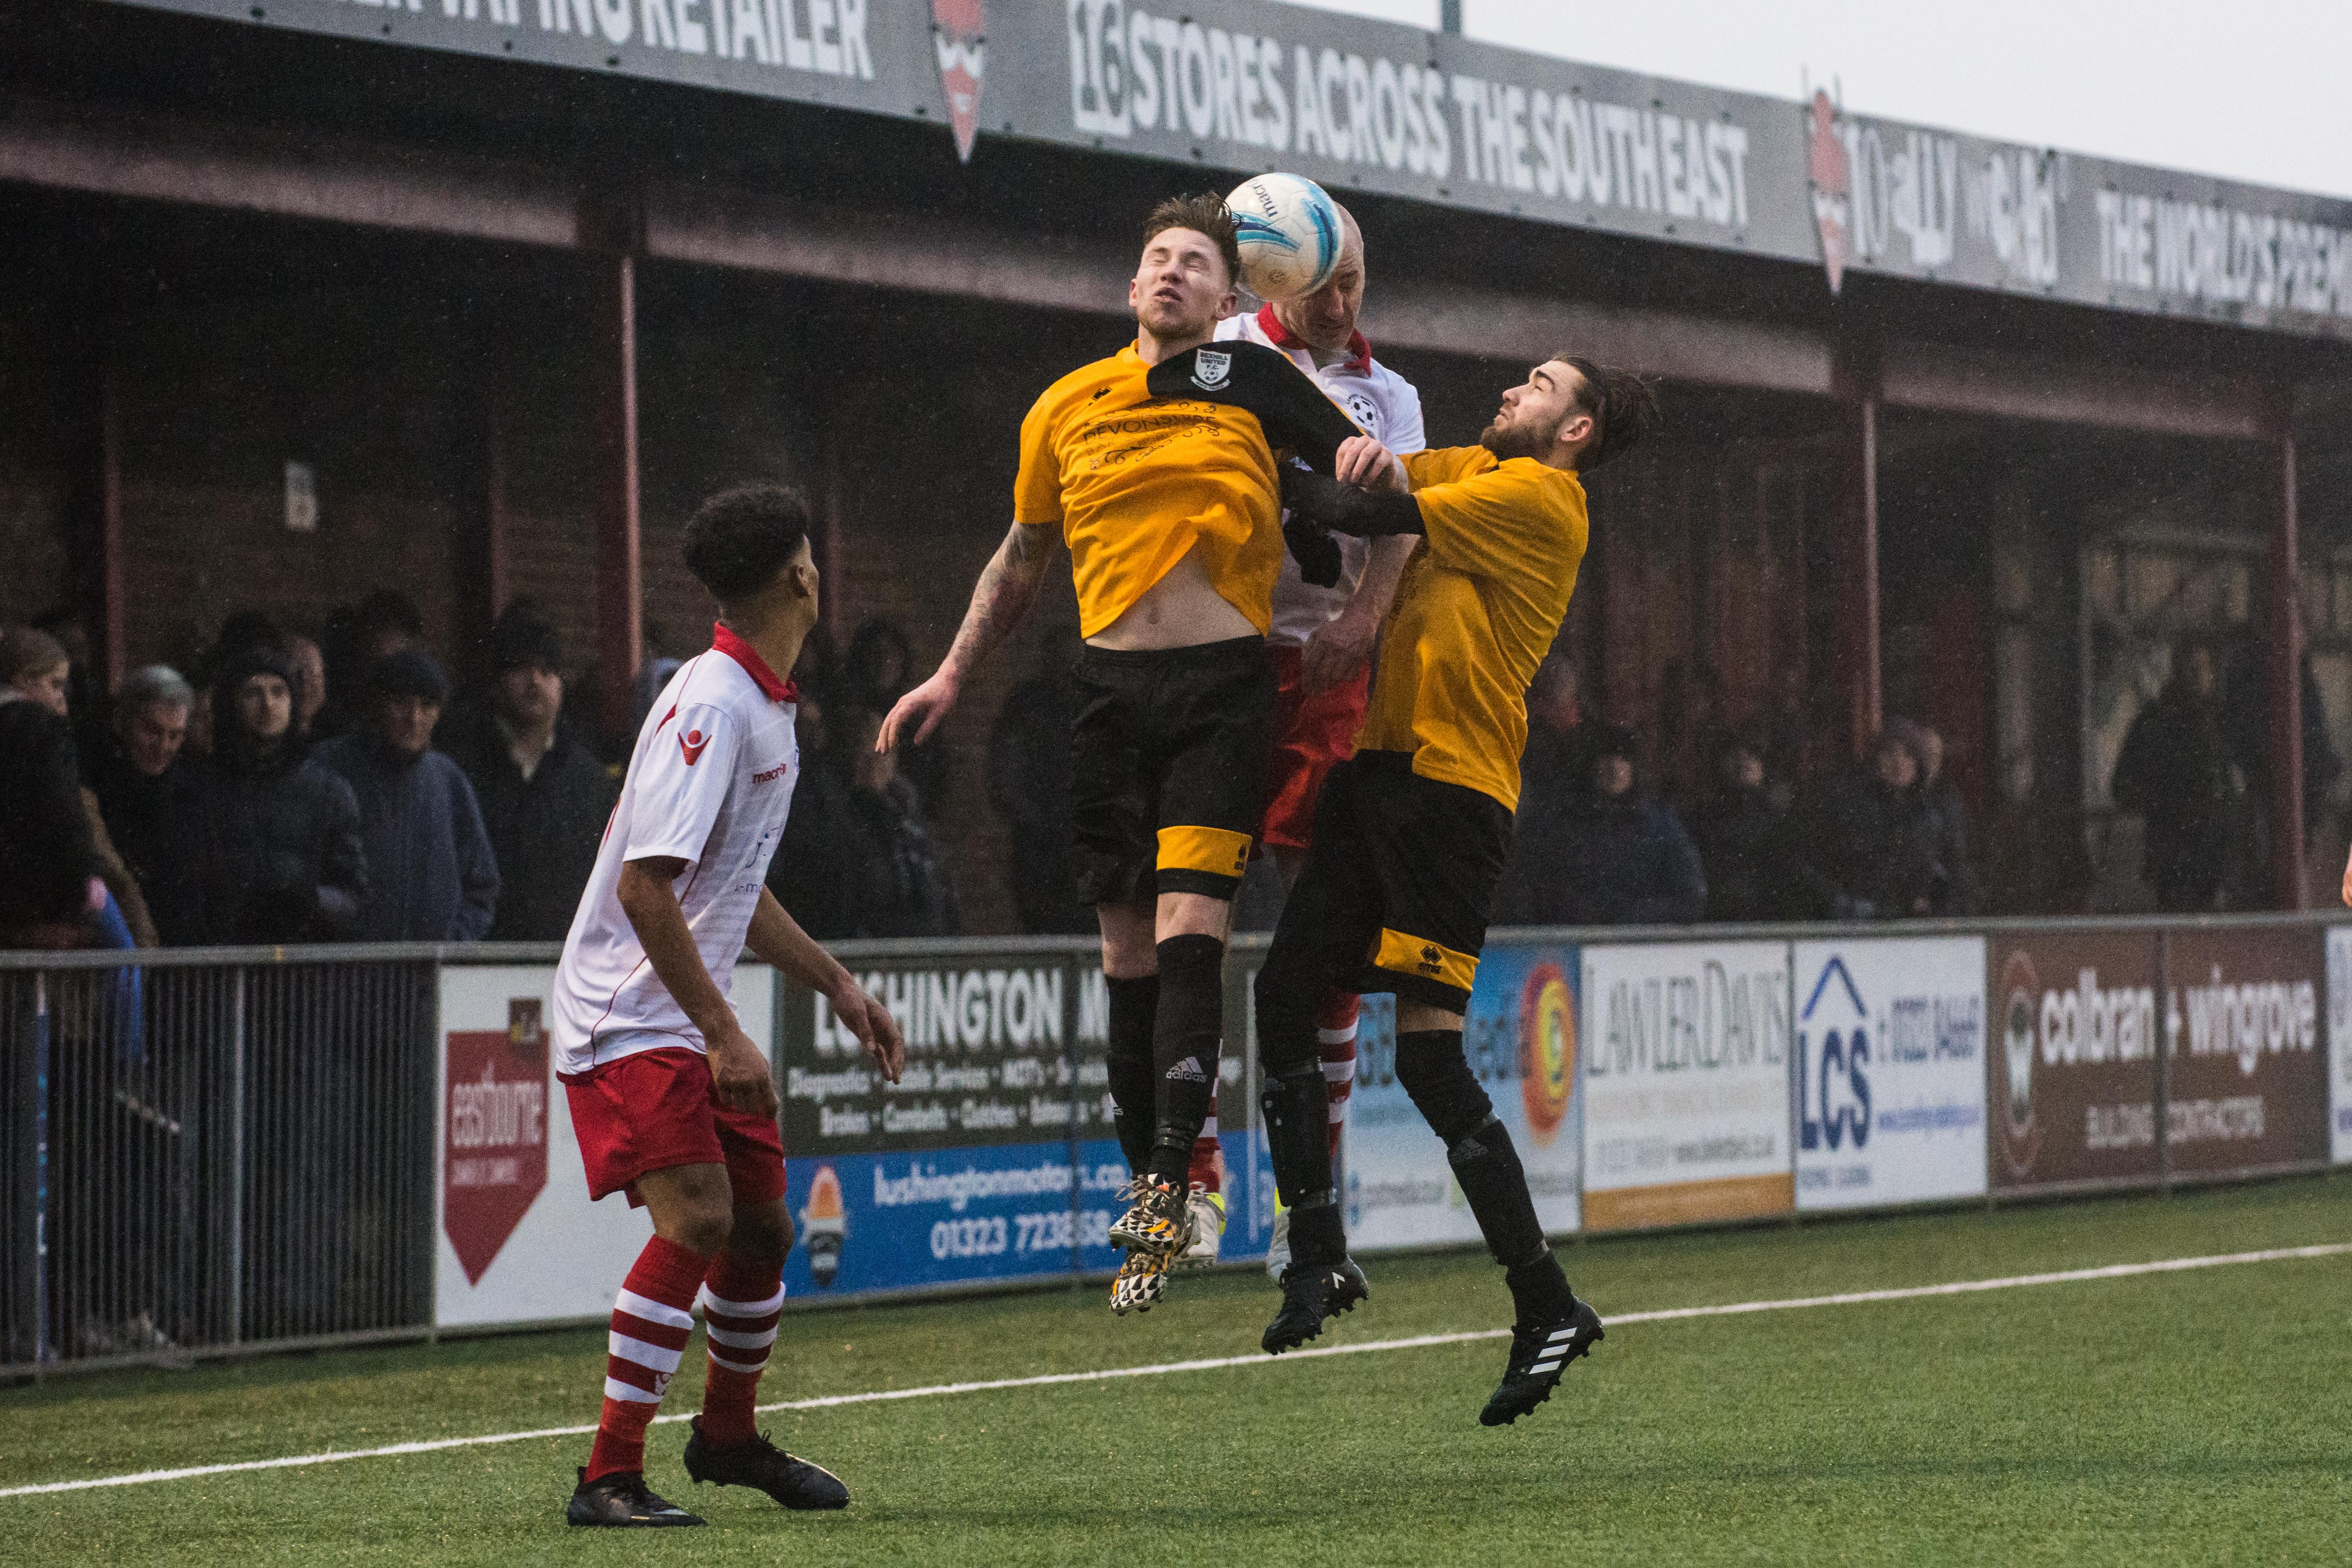 DAVID_JEFFERY Langney Wanderers FC vs Bexhill United FC 03.03.18 93